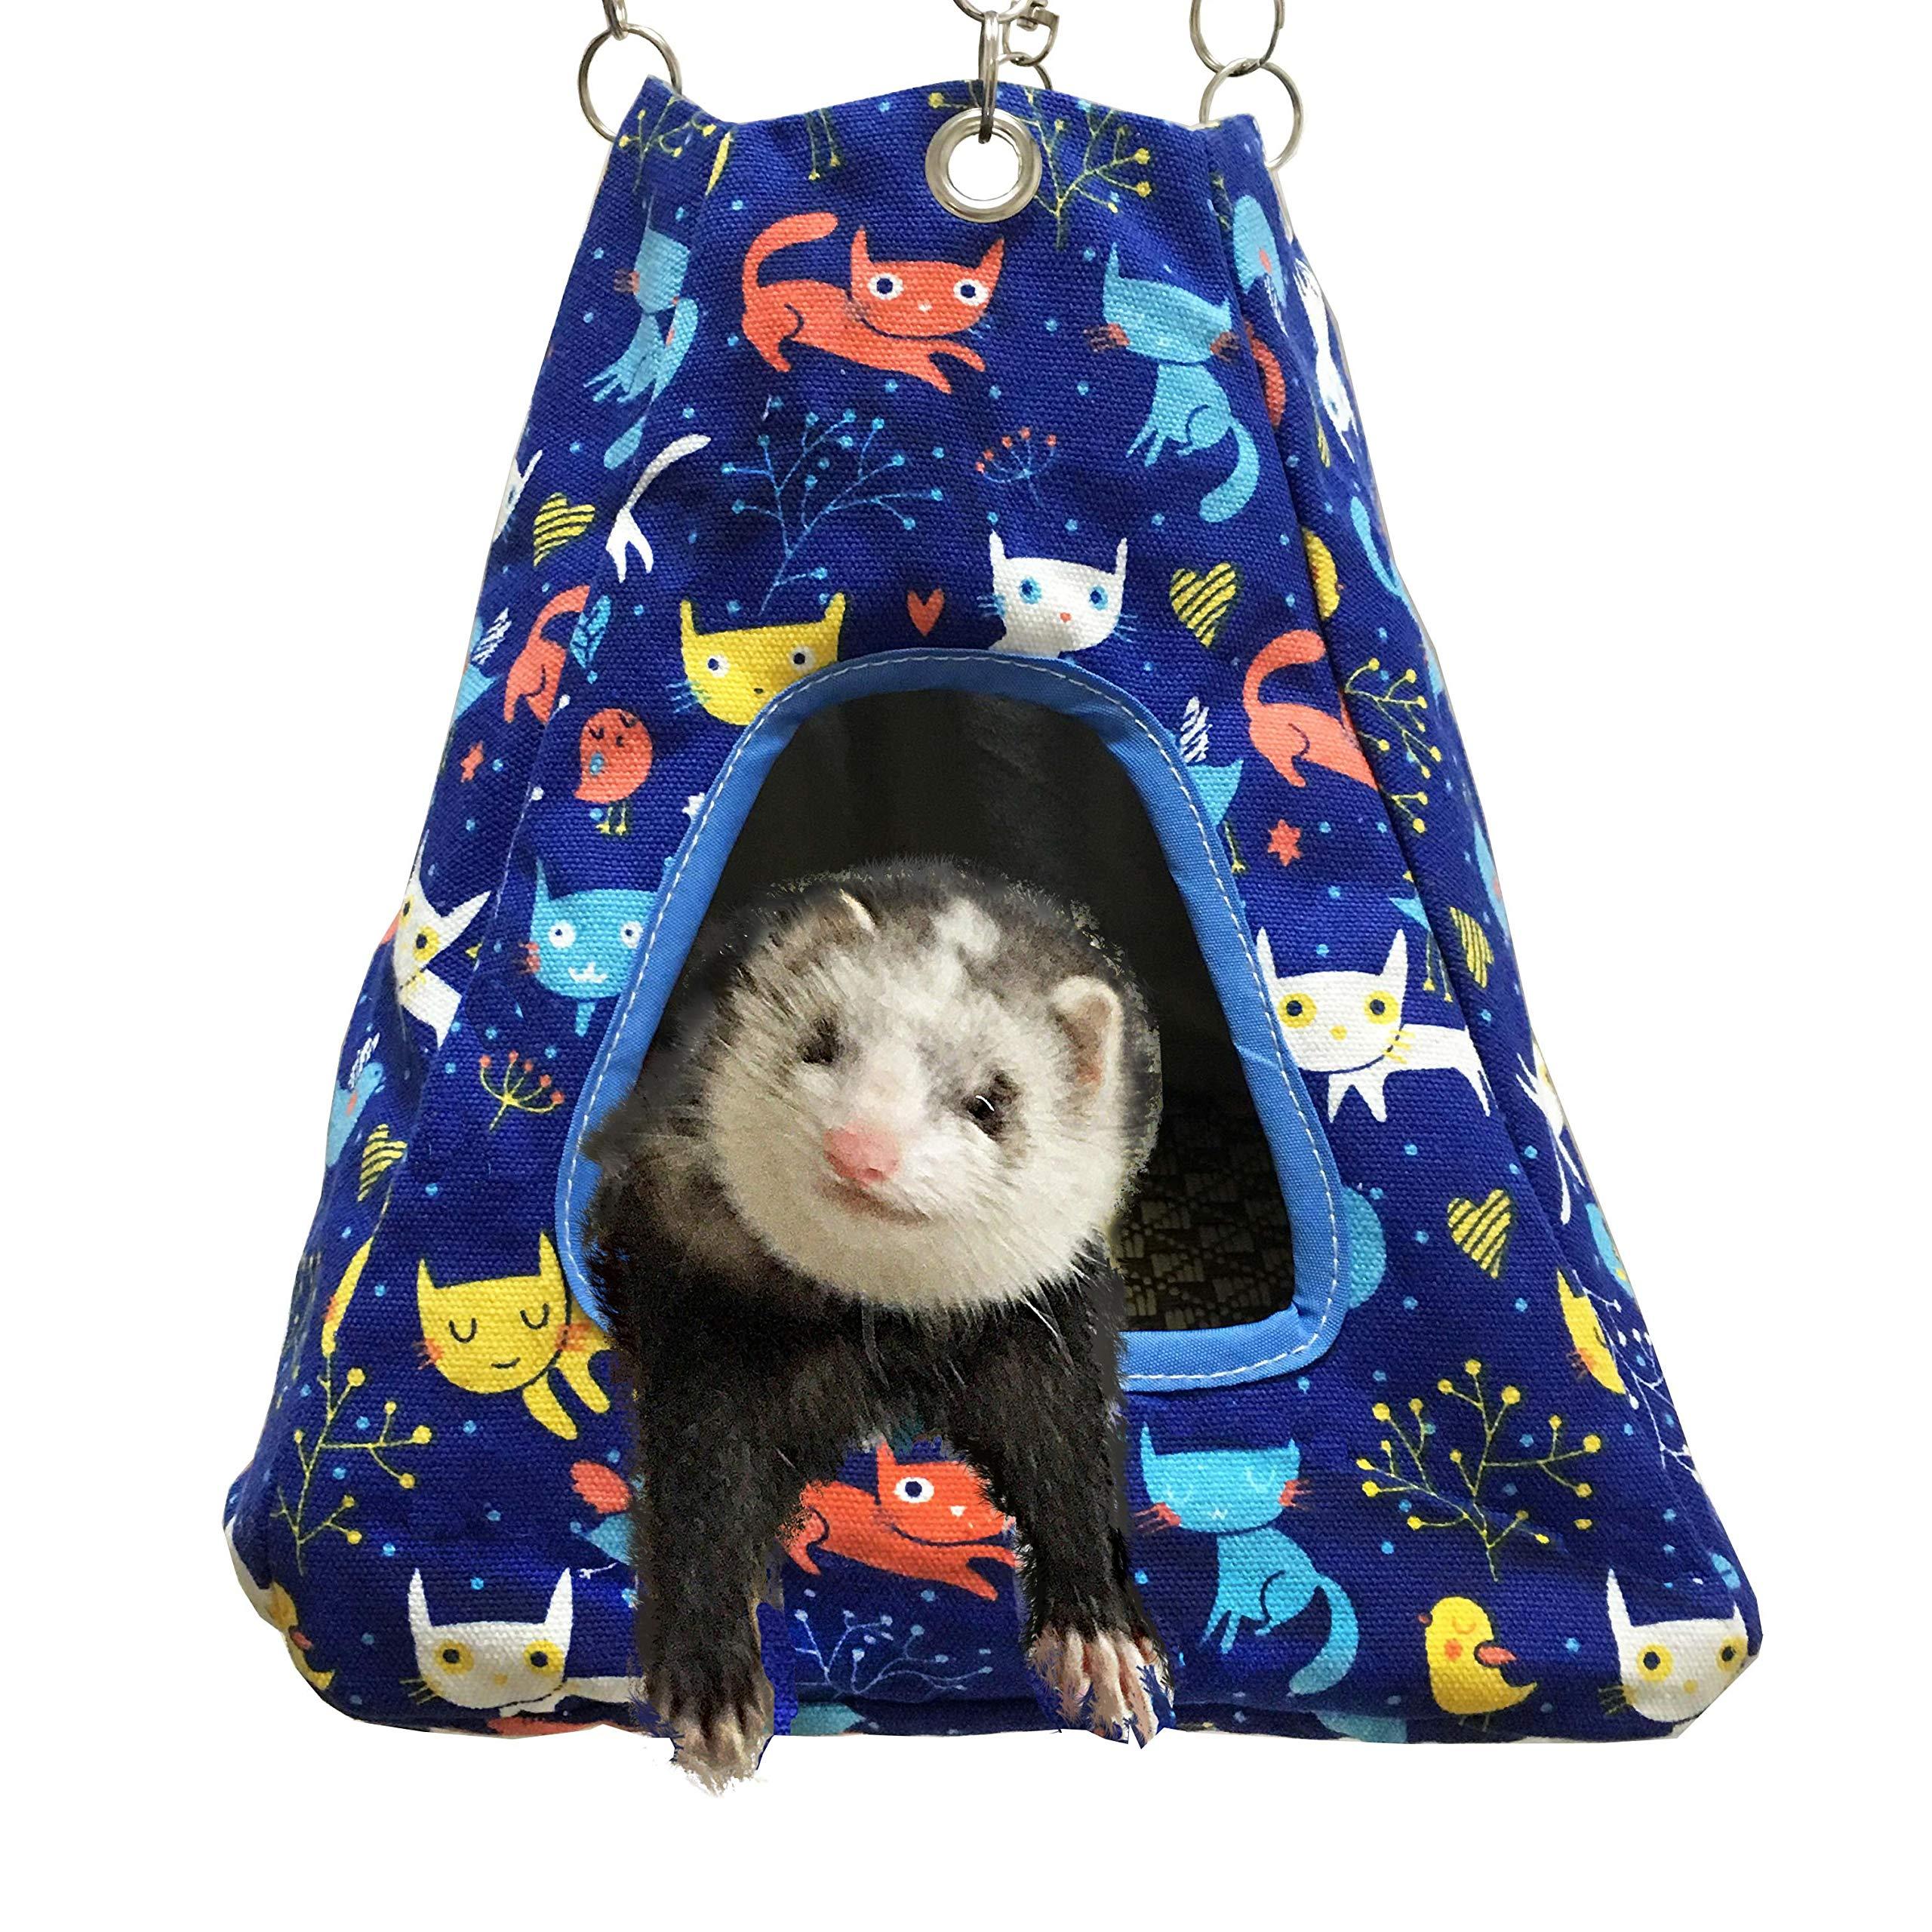 FULUE Small Animal Ferret Rat Guinea Pig Degu Gerbil Mice Hamster Chincilla Hammock Sleeper Cage Accessories (Blue Tent) by FULUE